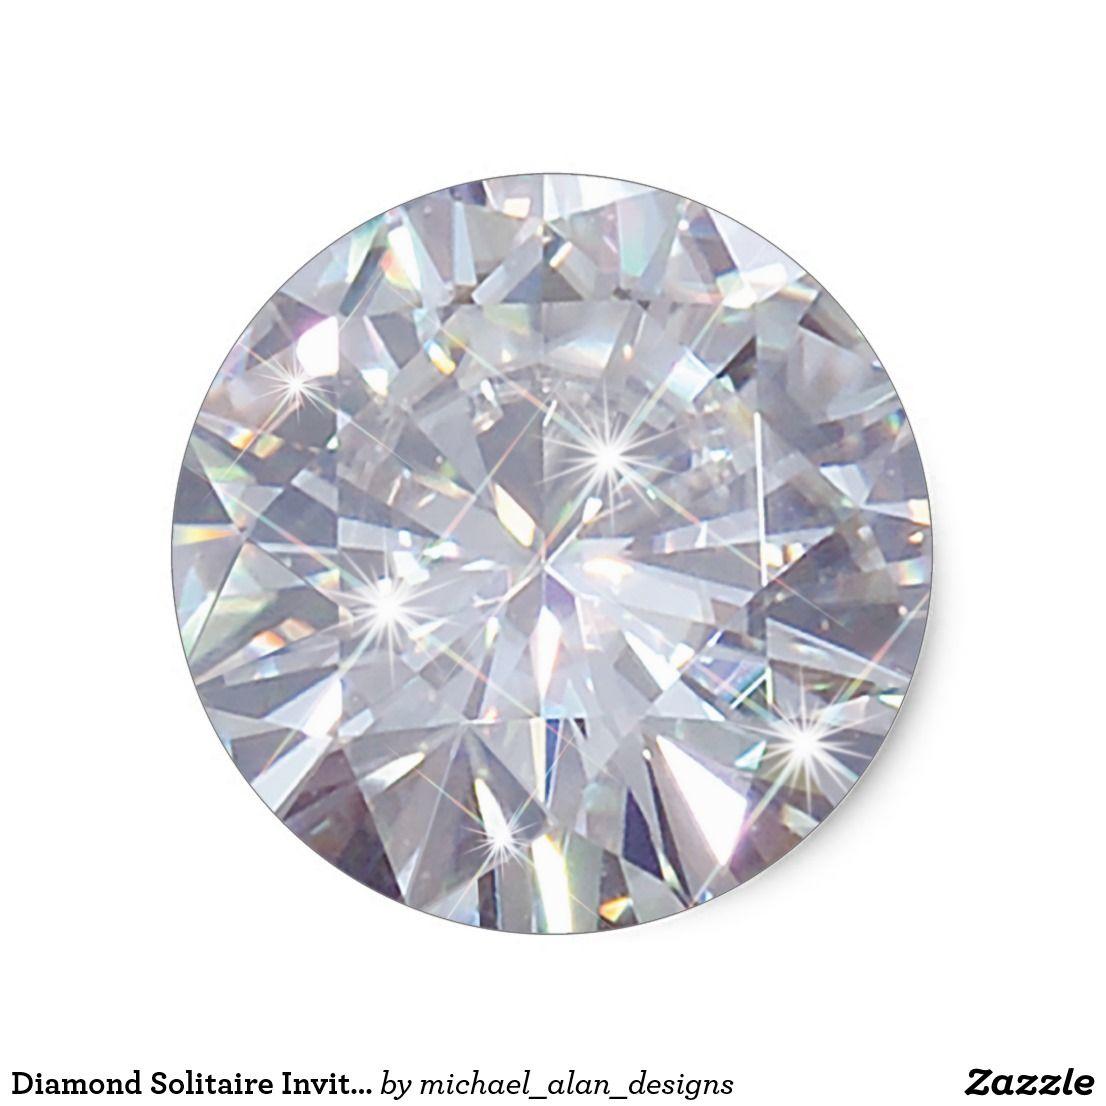 Diamond Solitaire Invitation Envelope Stickers Zazzle Com Diamond Image Diamond Background Man Made Diamonds